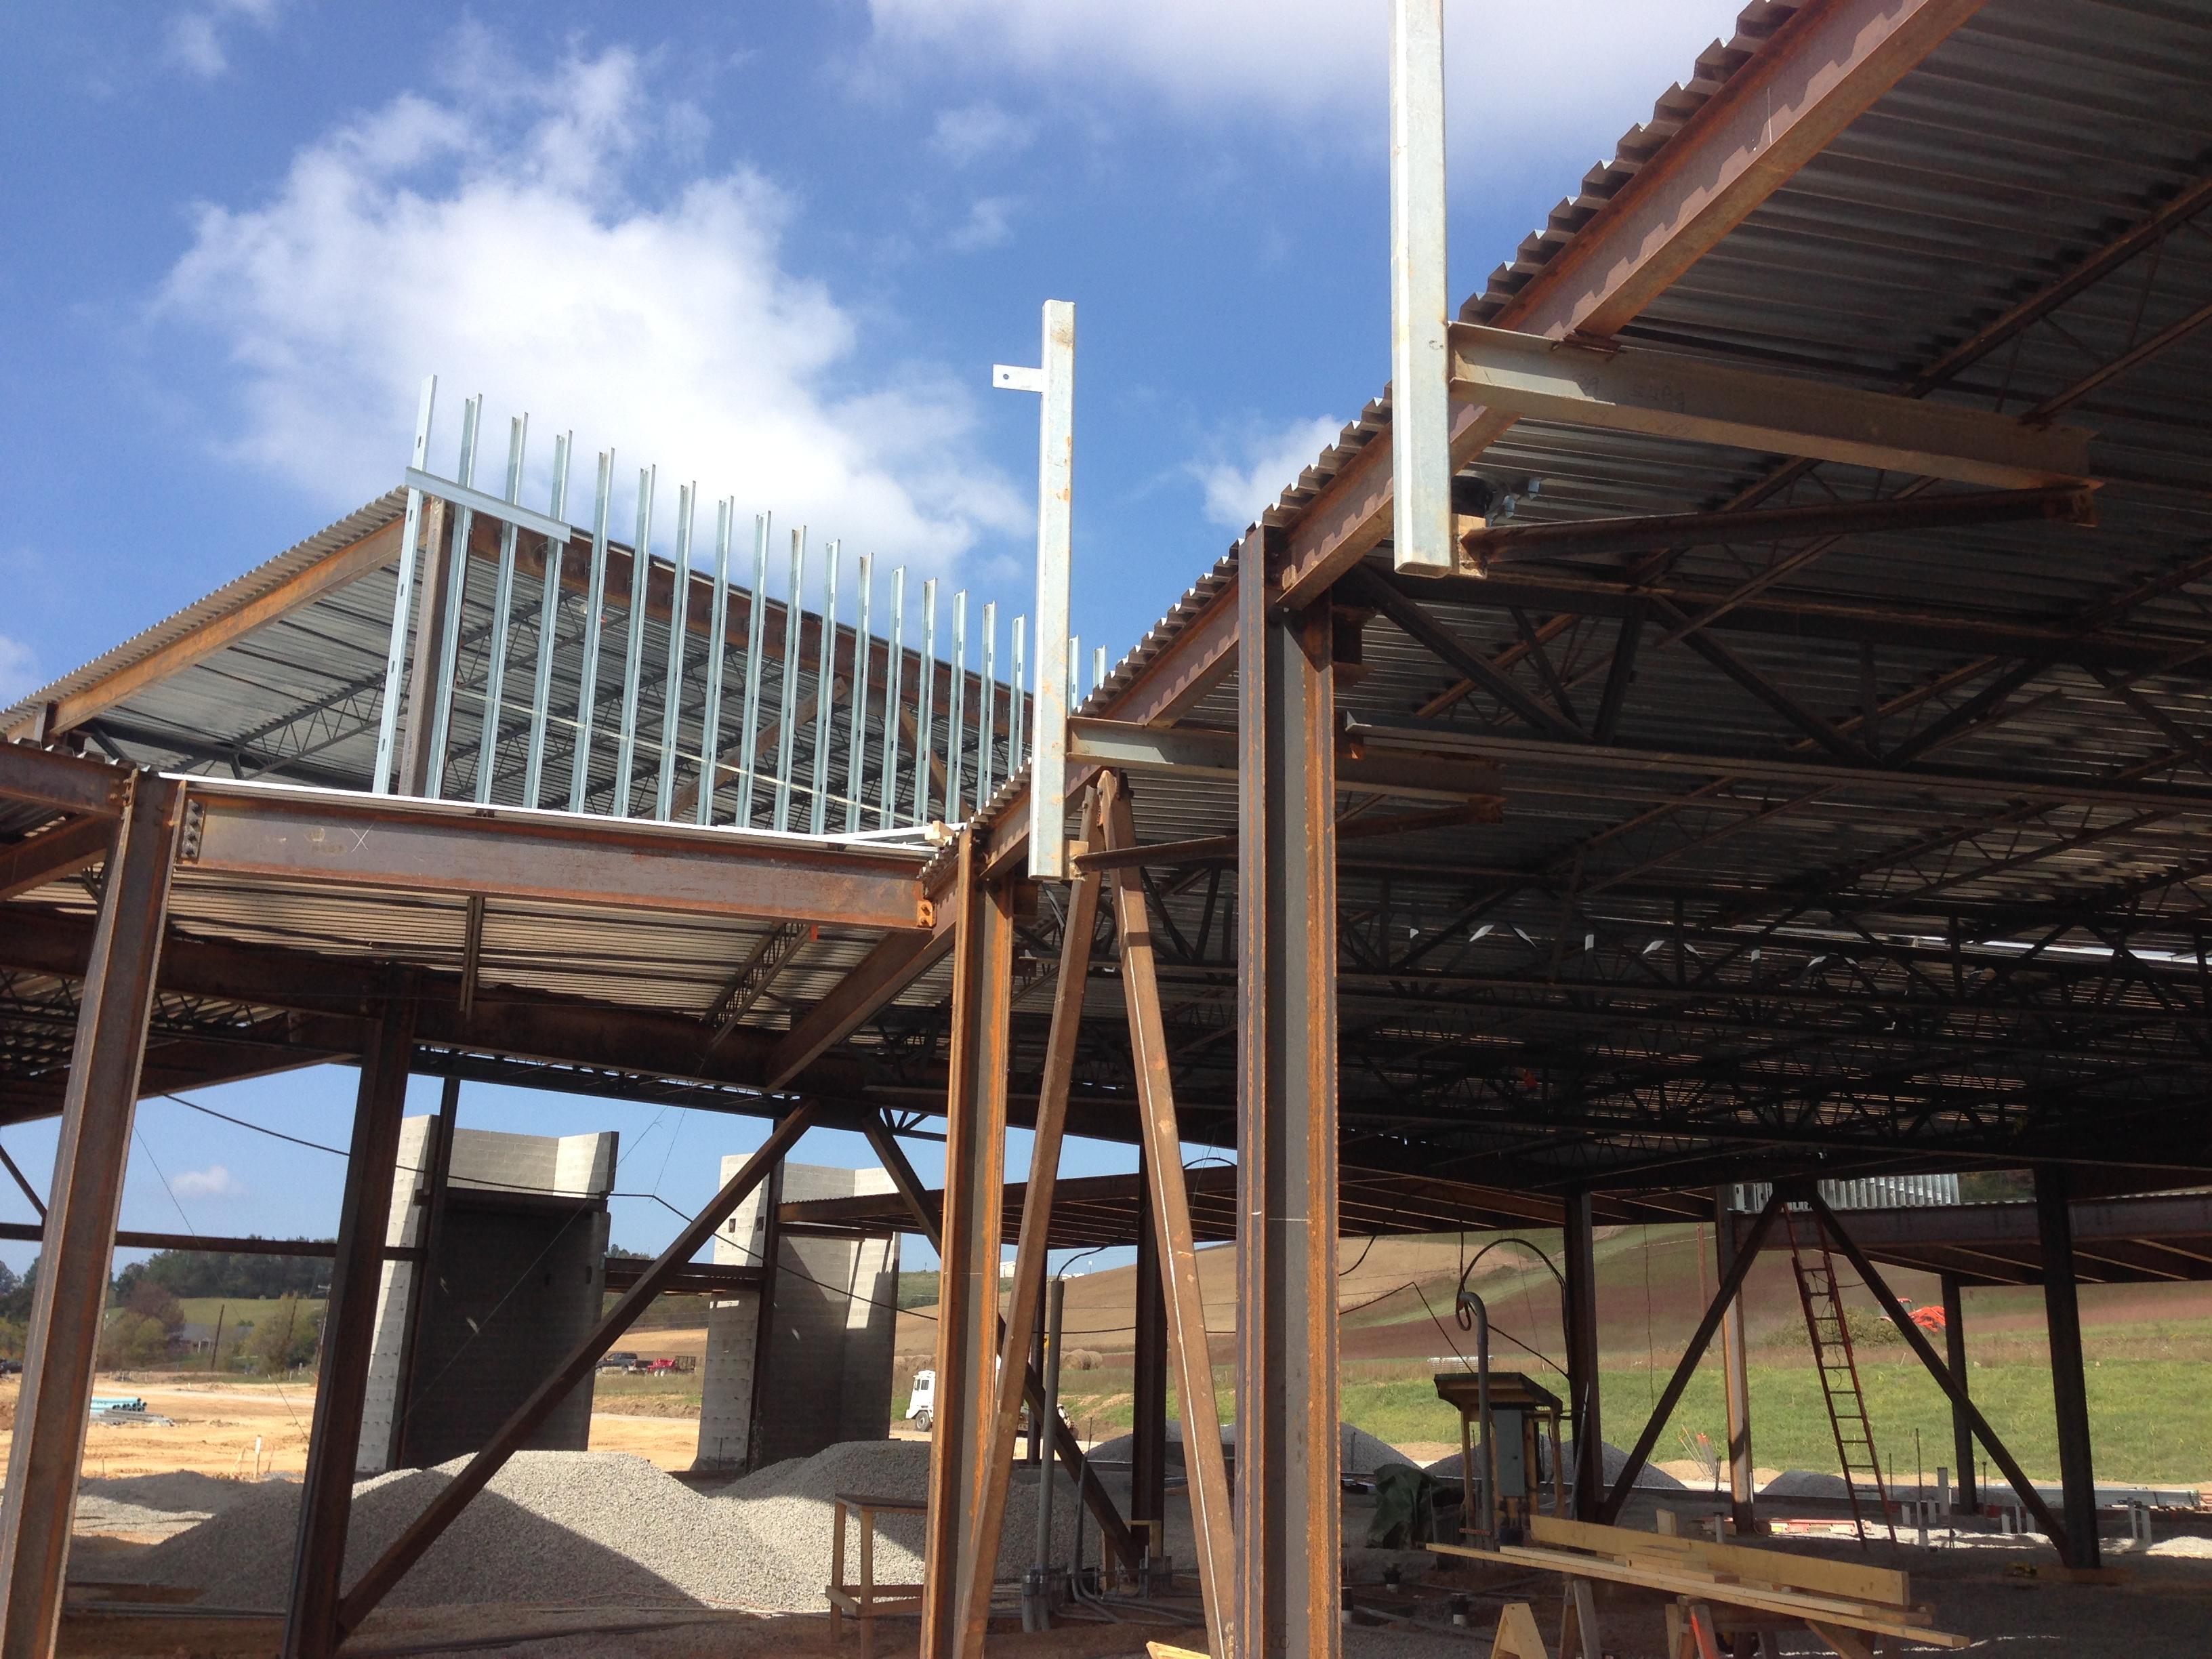 William_Sharpe_Hospital_Construction